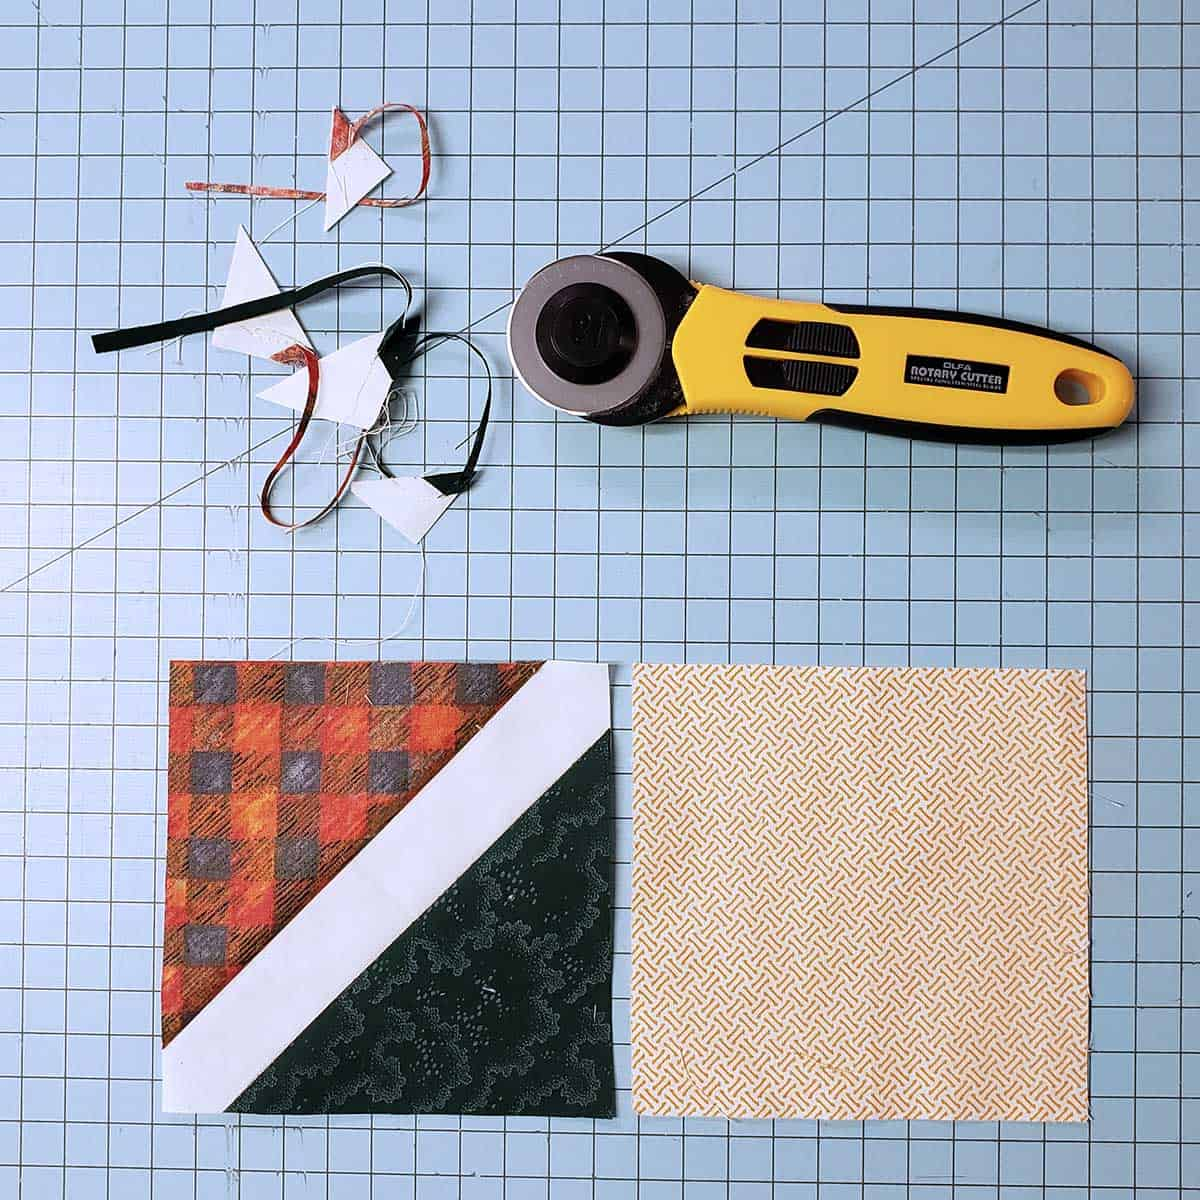 Making the quilt blocks